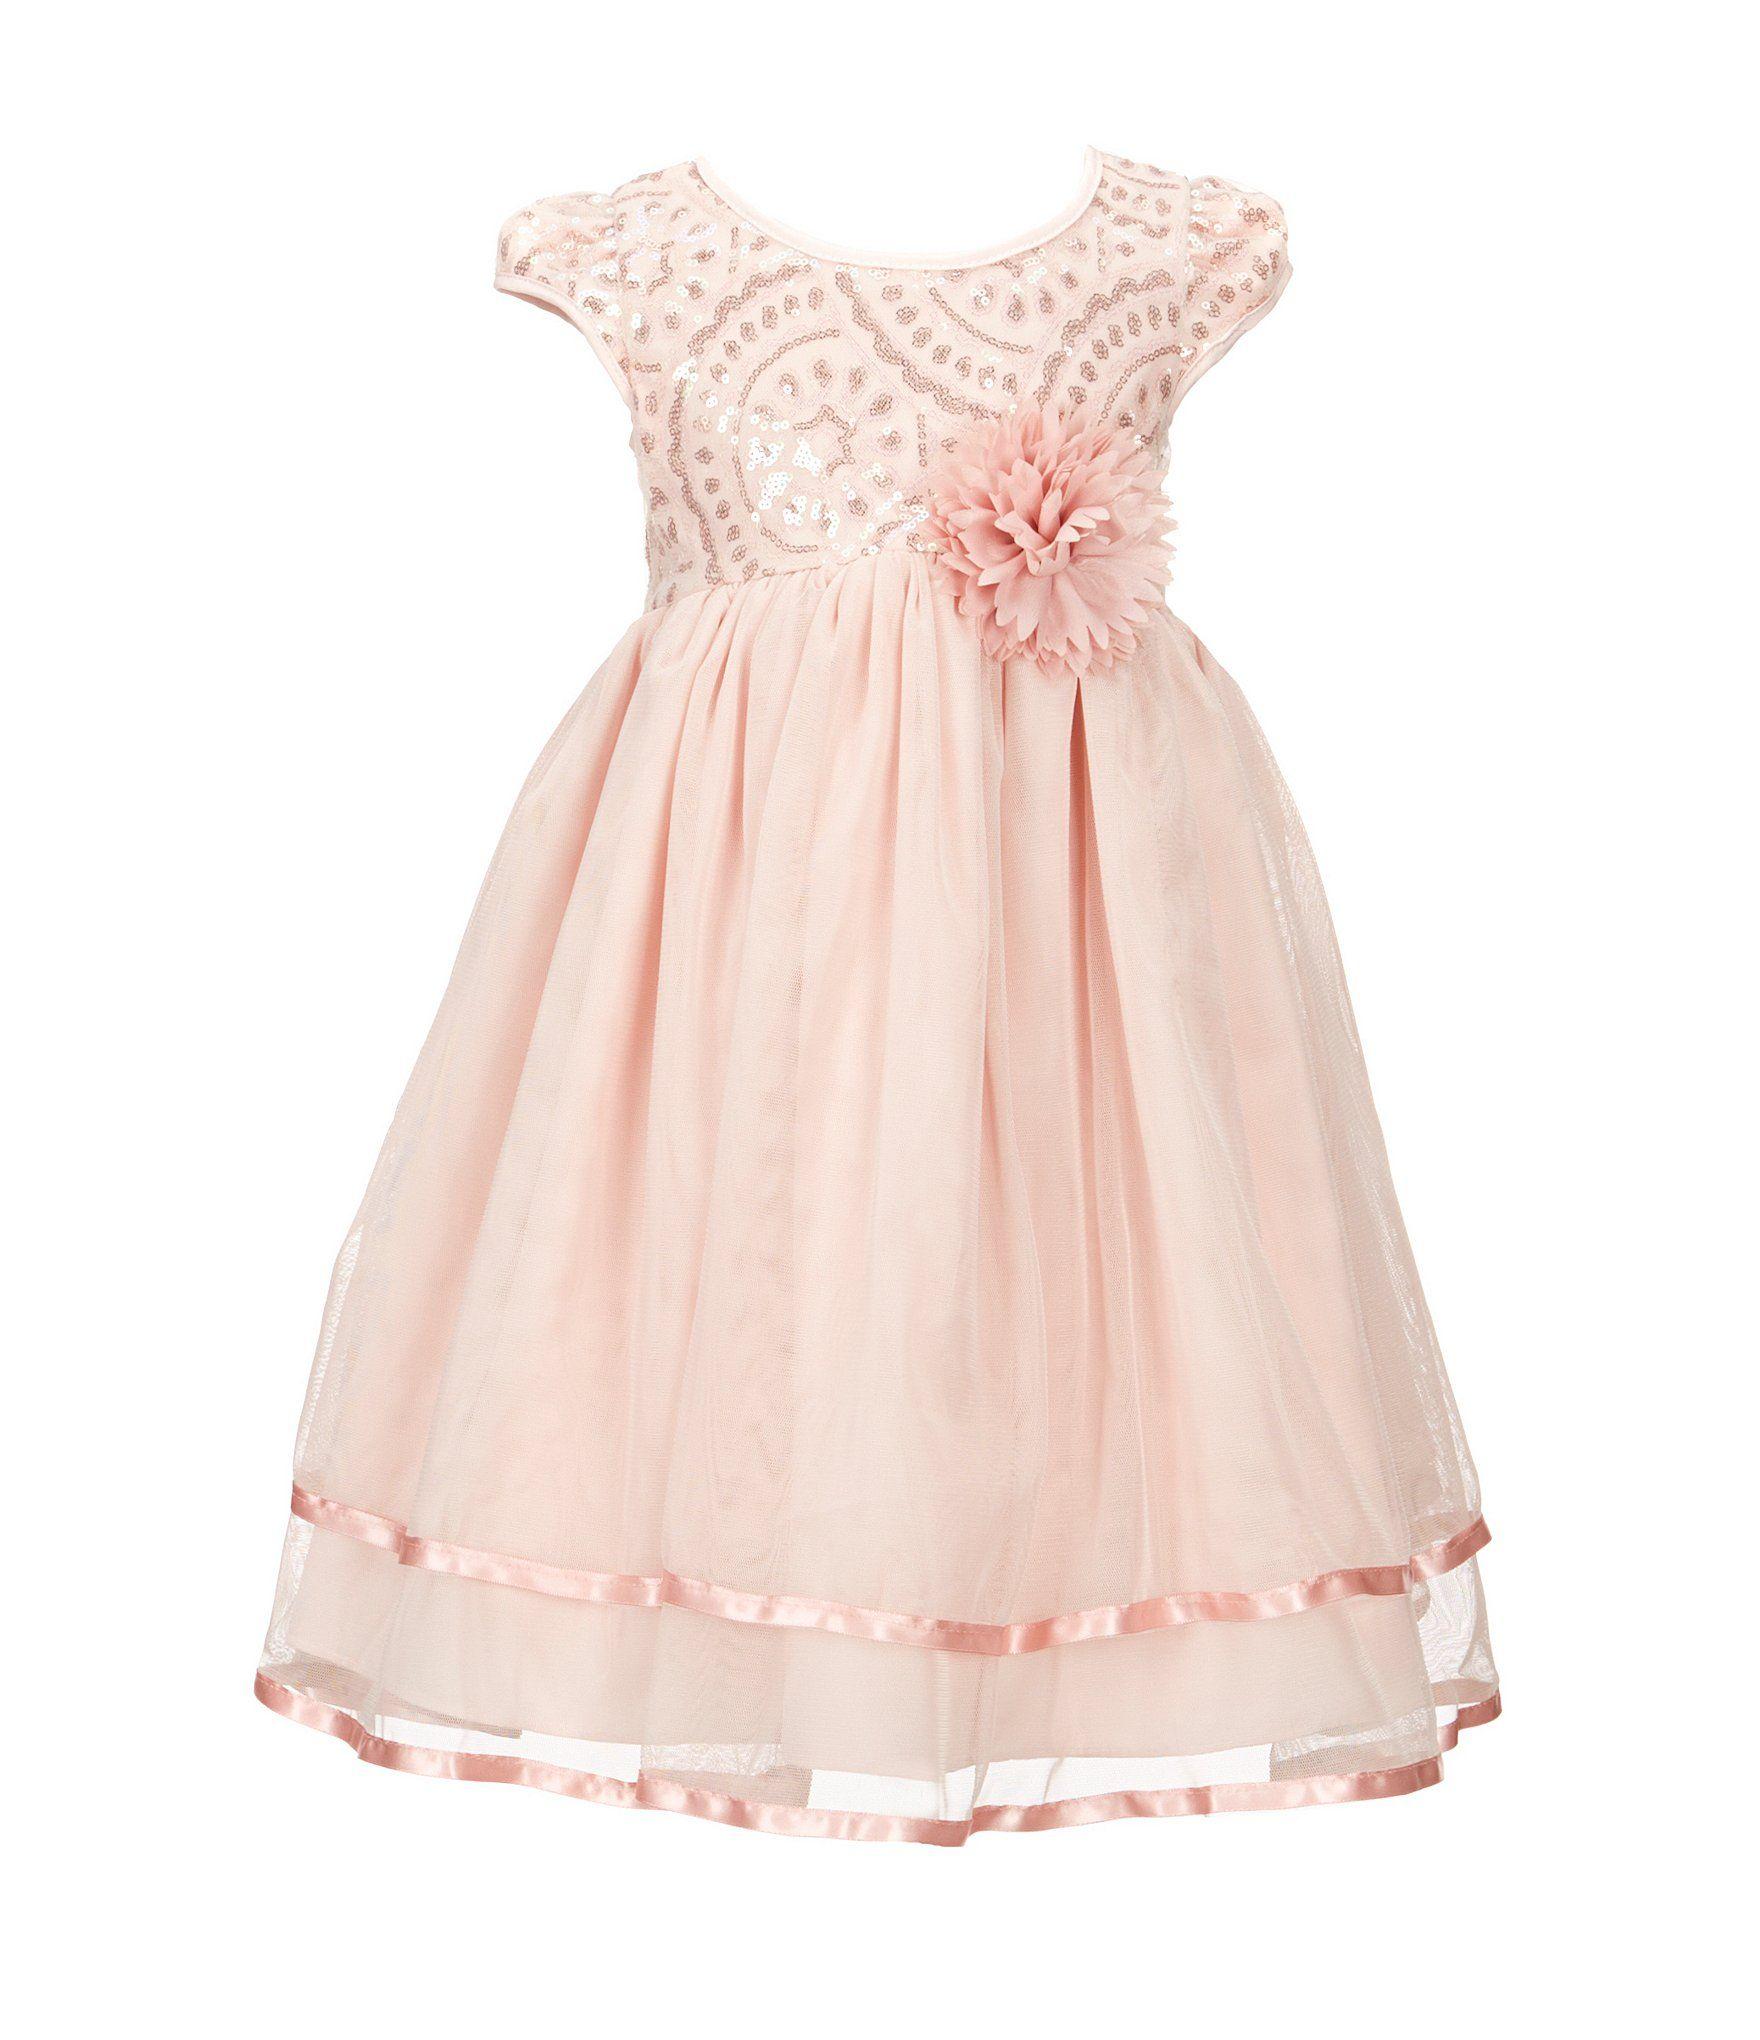 Marmellata Little Girls 2T6X Embellished Tulle Dress Dillards